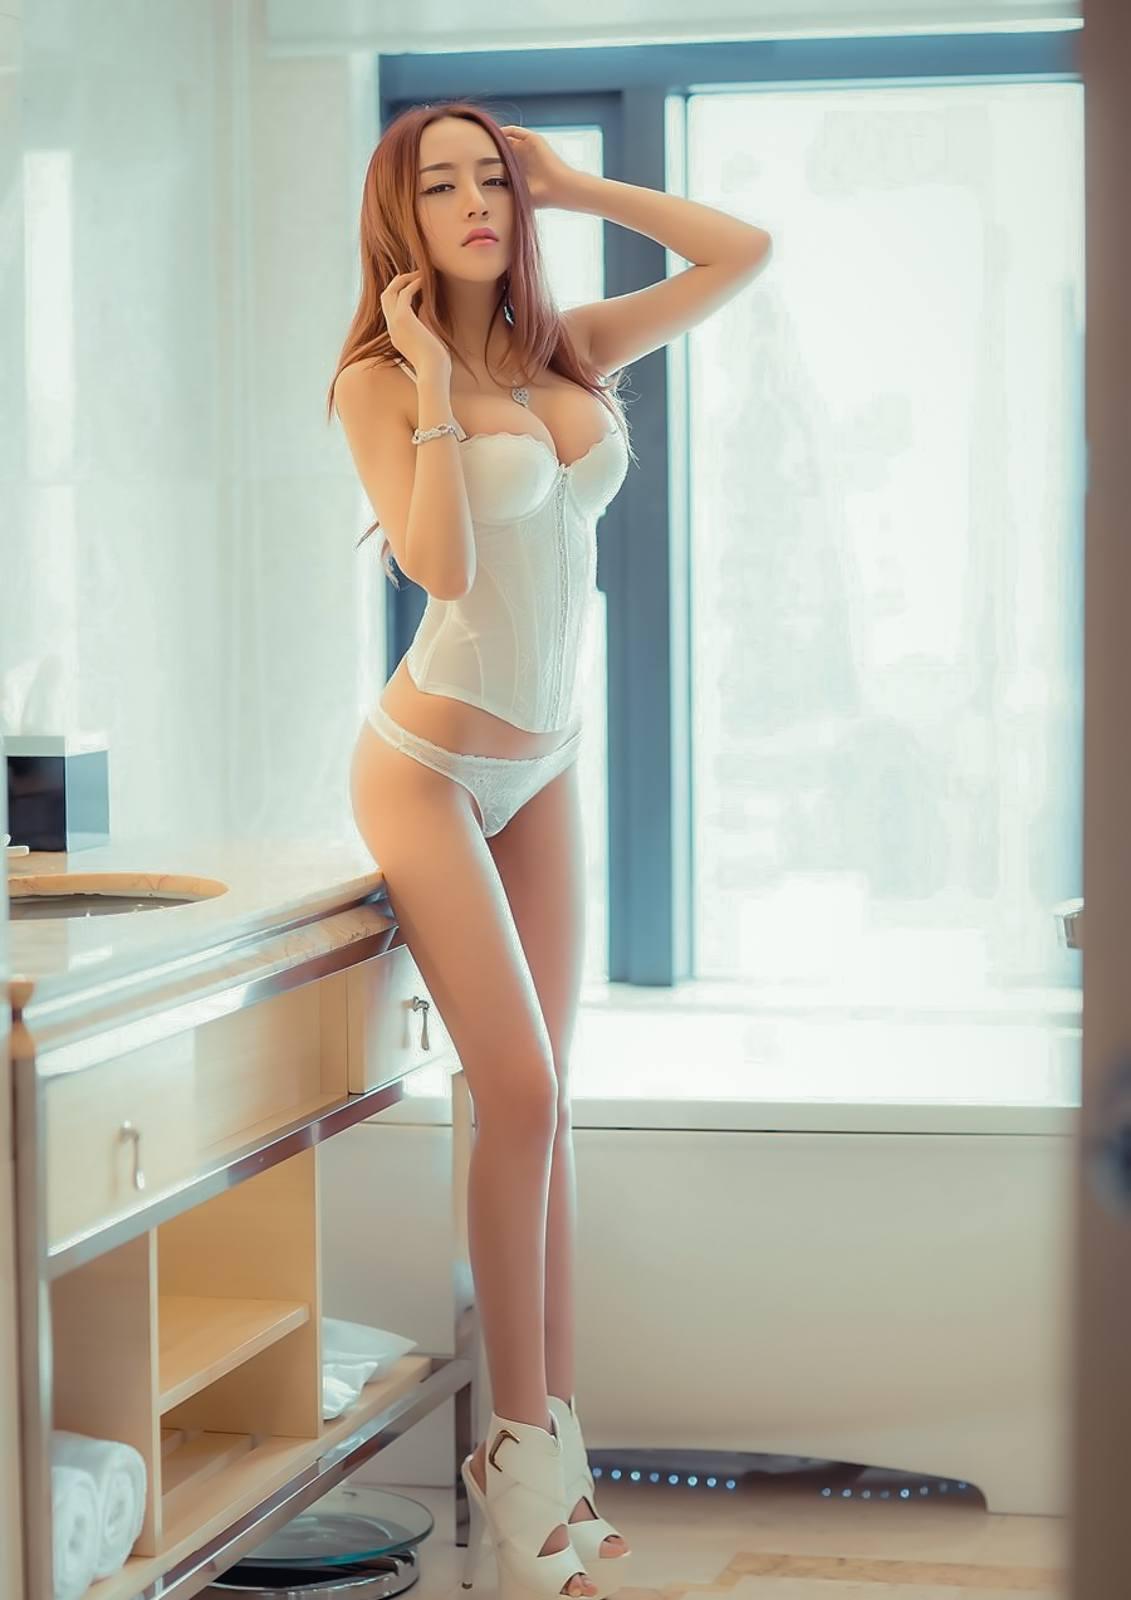 Mi%2BYeon%2BLee%2B%25E6%259D%258E%25E7%25BE%258E%25E5%25A6%258D%2B %2BBubbles Covered%2BNude%2BOutdoors%2B %2B005 - Korean Nude - Big Albom Remain #A-korean girl